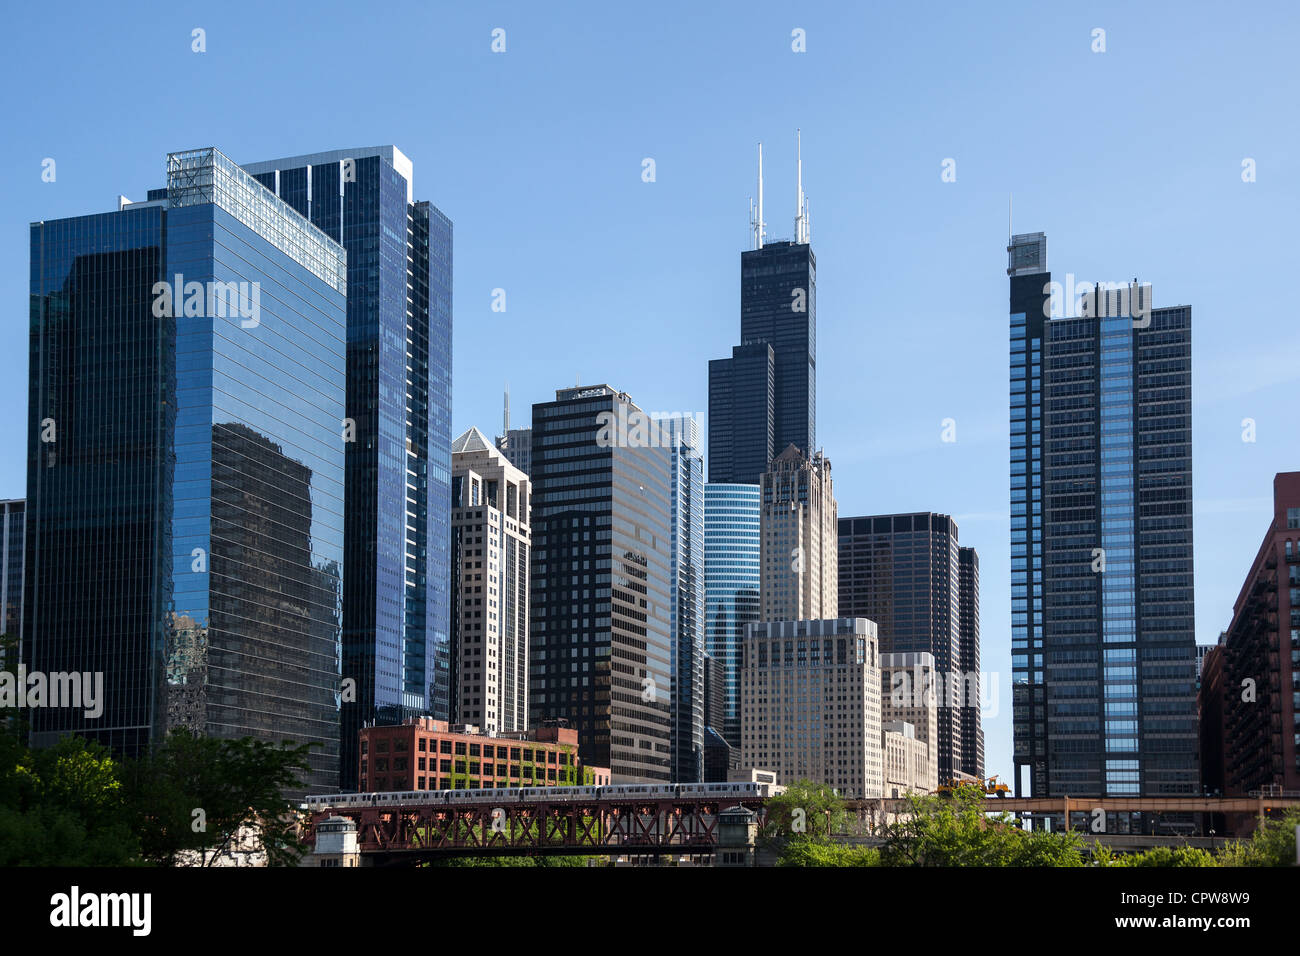 Chigaco ville avec la Willis tower à distance, Chicago, Illinois, USA Photo Stock